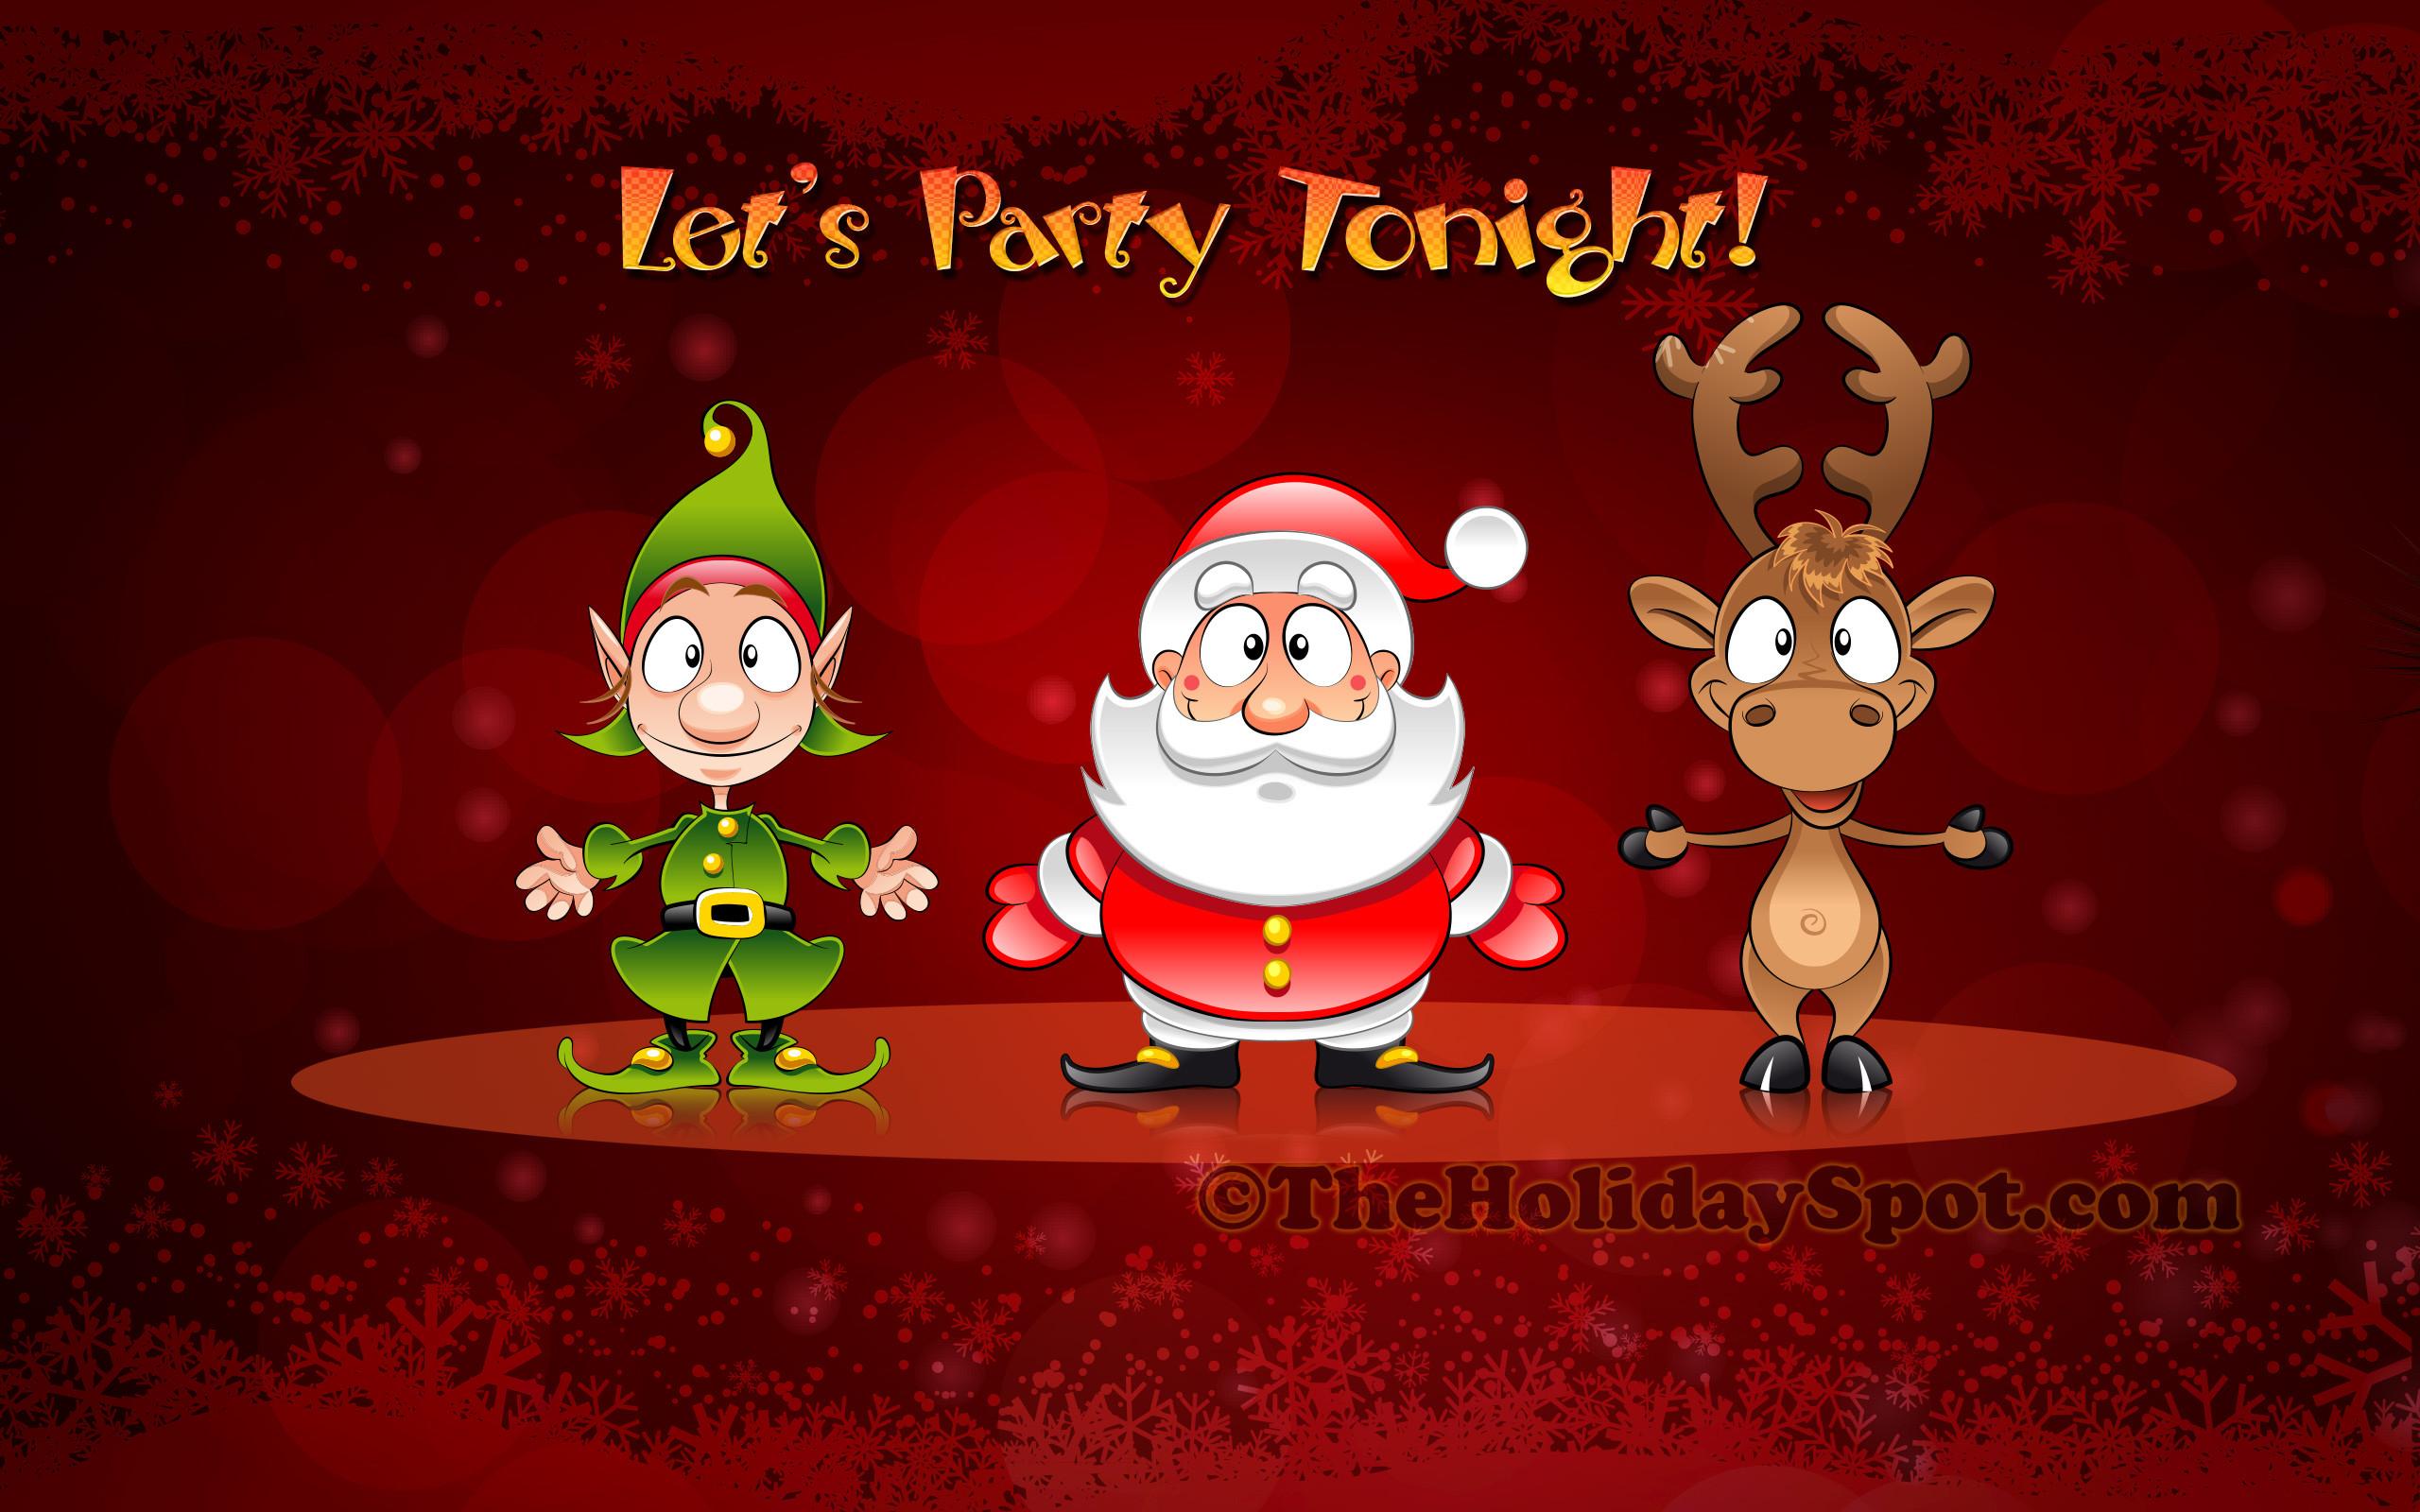 Res: 2560x1600, Christmas Wallpaper of Santa, Elve and Reindeer